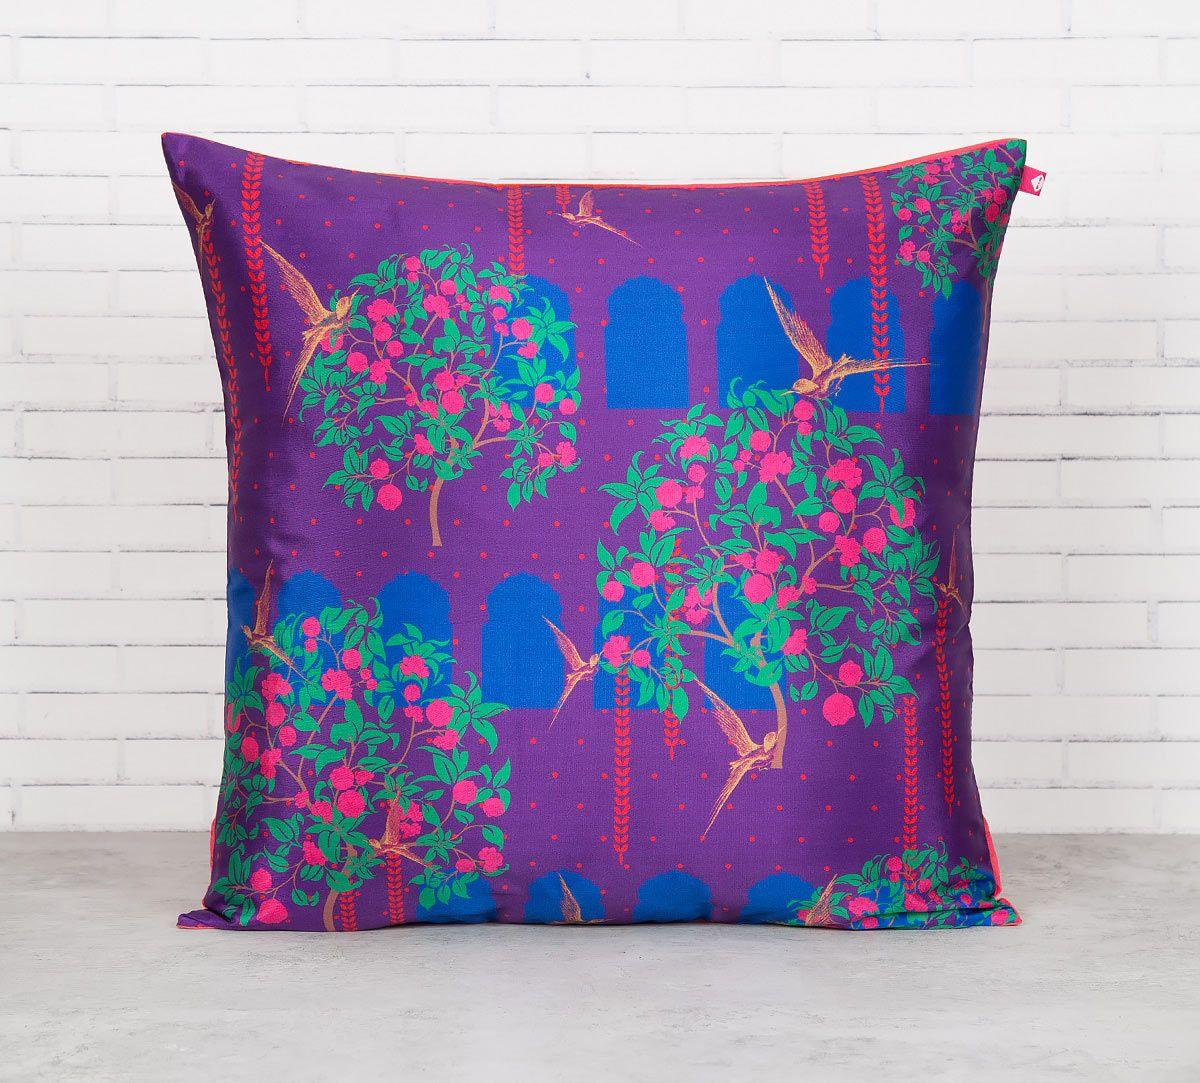 India Circus Eggplant Berry Pecker Blended Taf Silk Cushion Cover